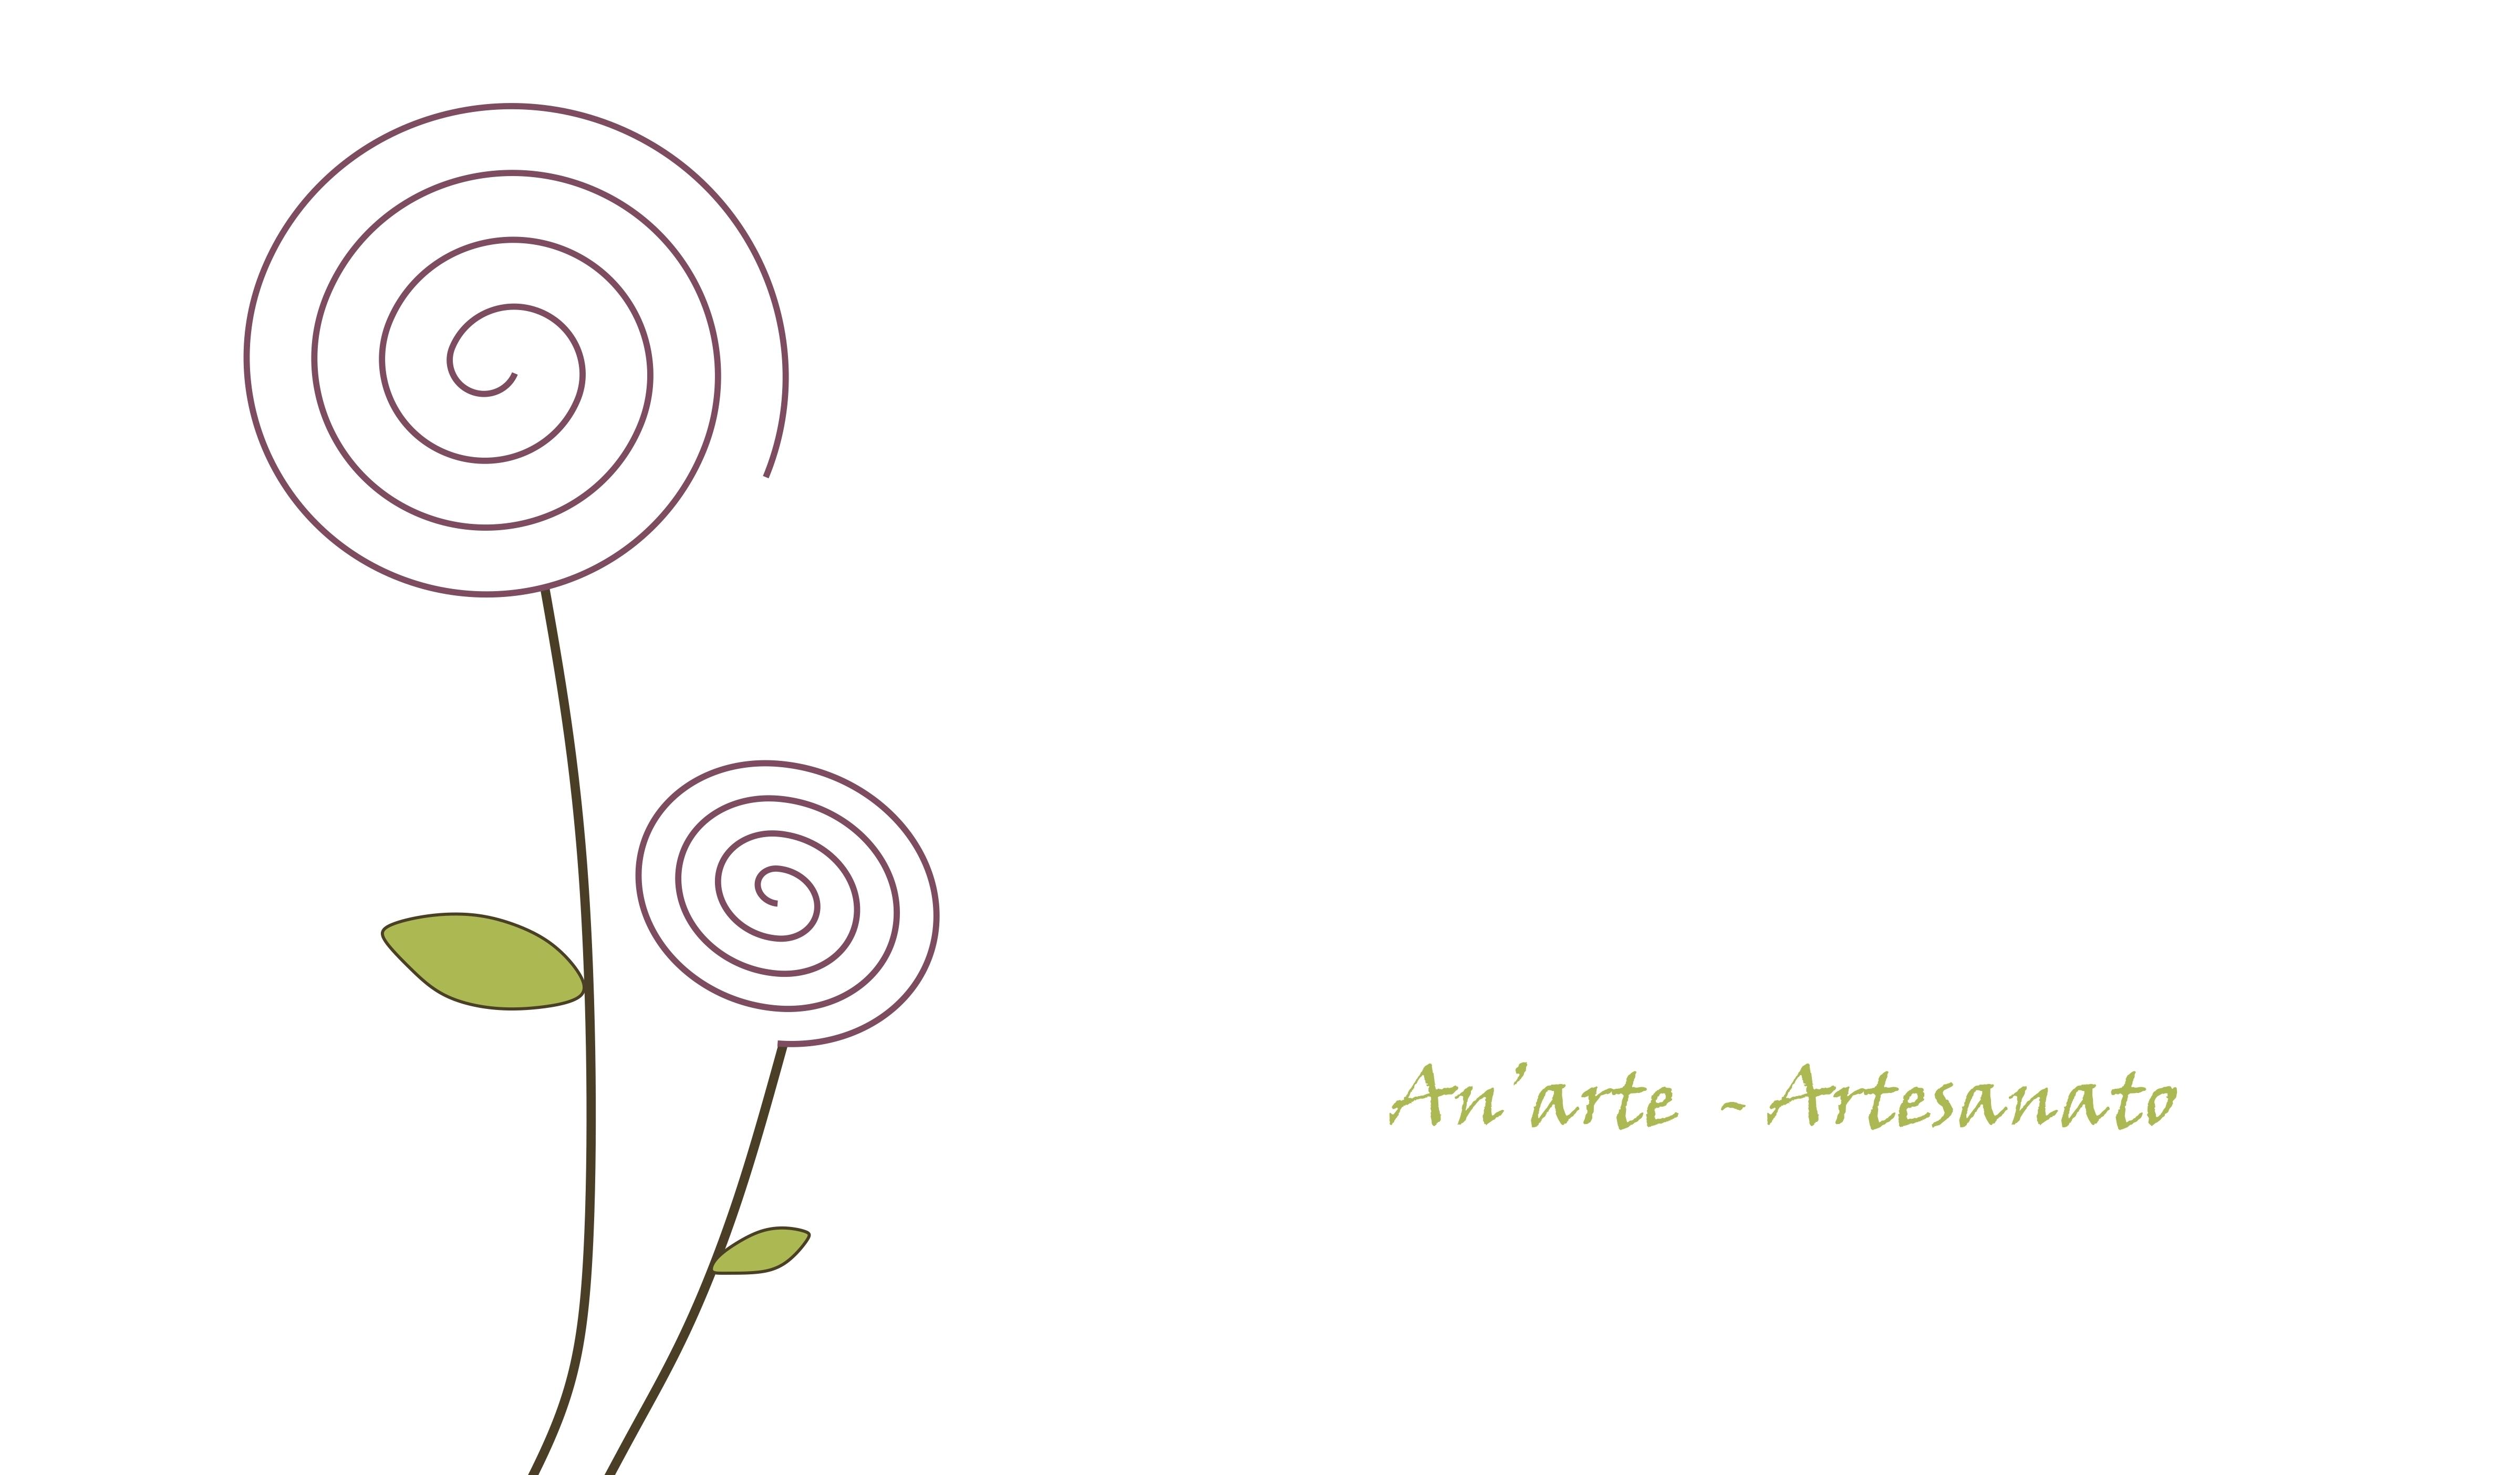 An'arte - Artesanato